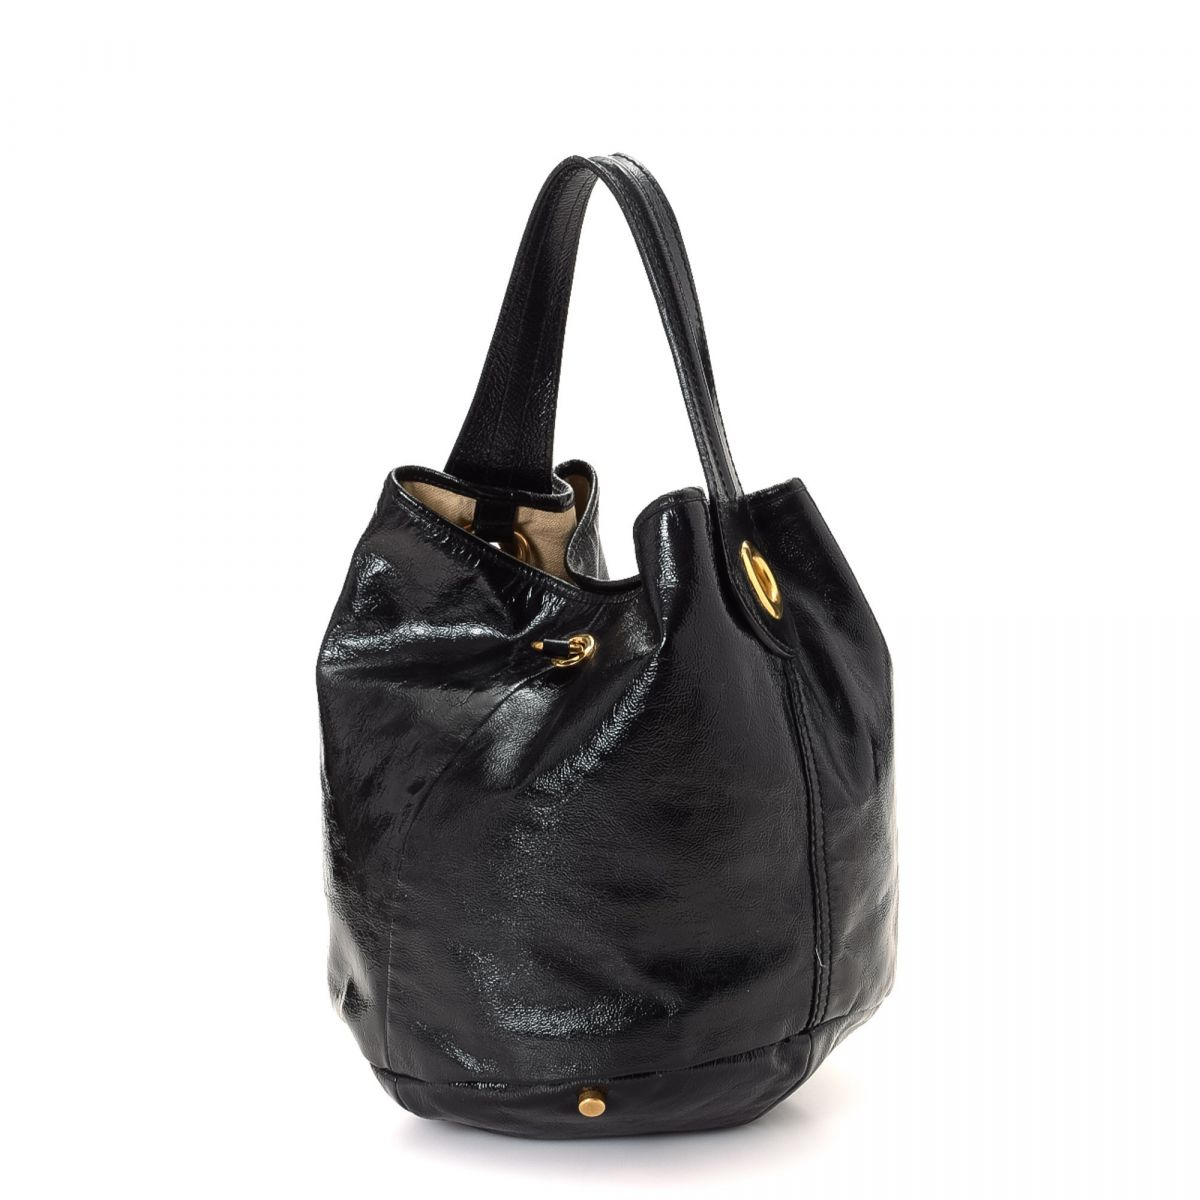 Yves Saint Laurent Handbags | Ysl Crossbody Bag | Saint Laurent Shopper Tote